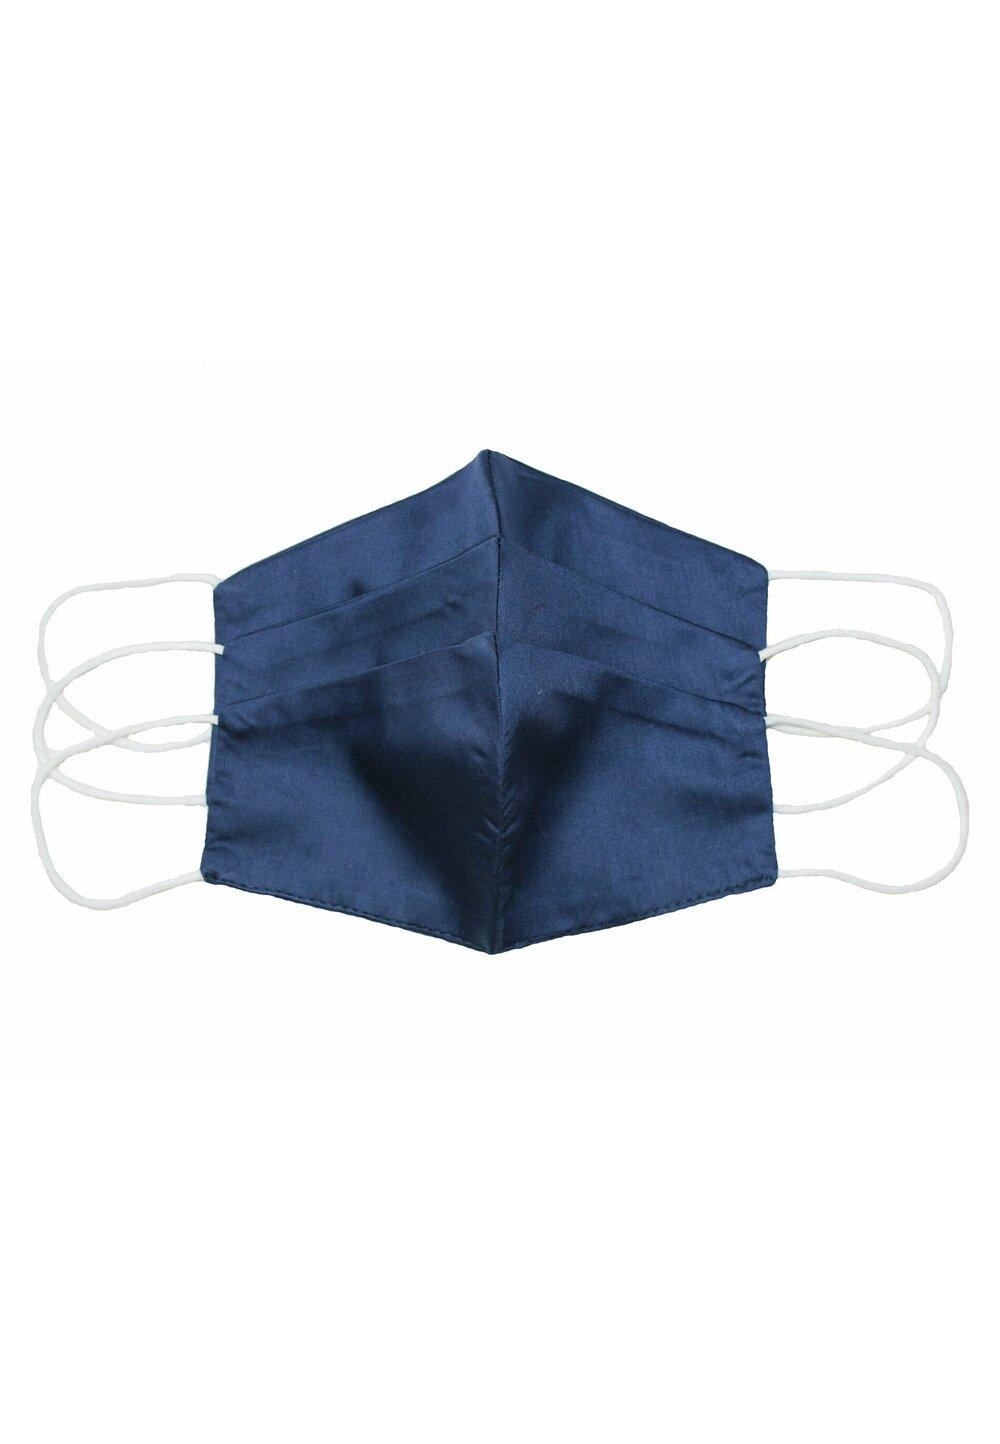 Masca reutilizabila, set 3 buc,copii, 6-10 ani, bluemarin imagine